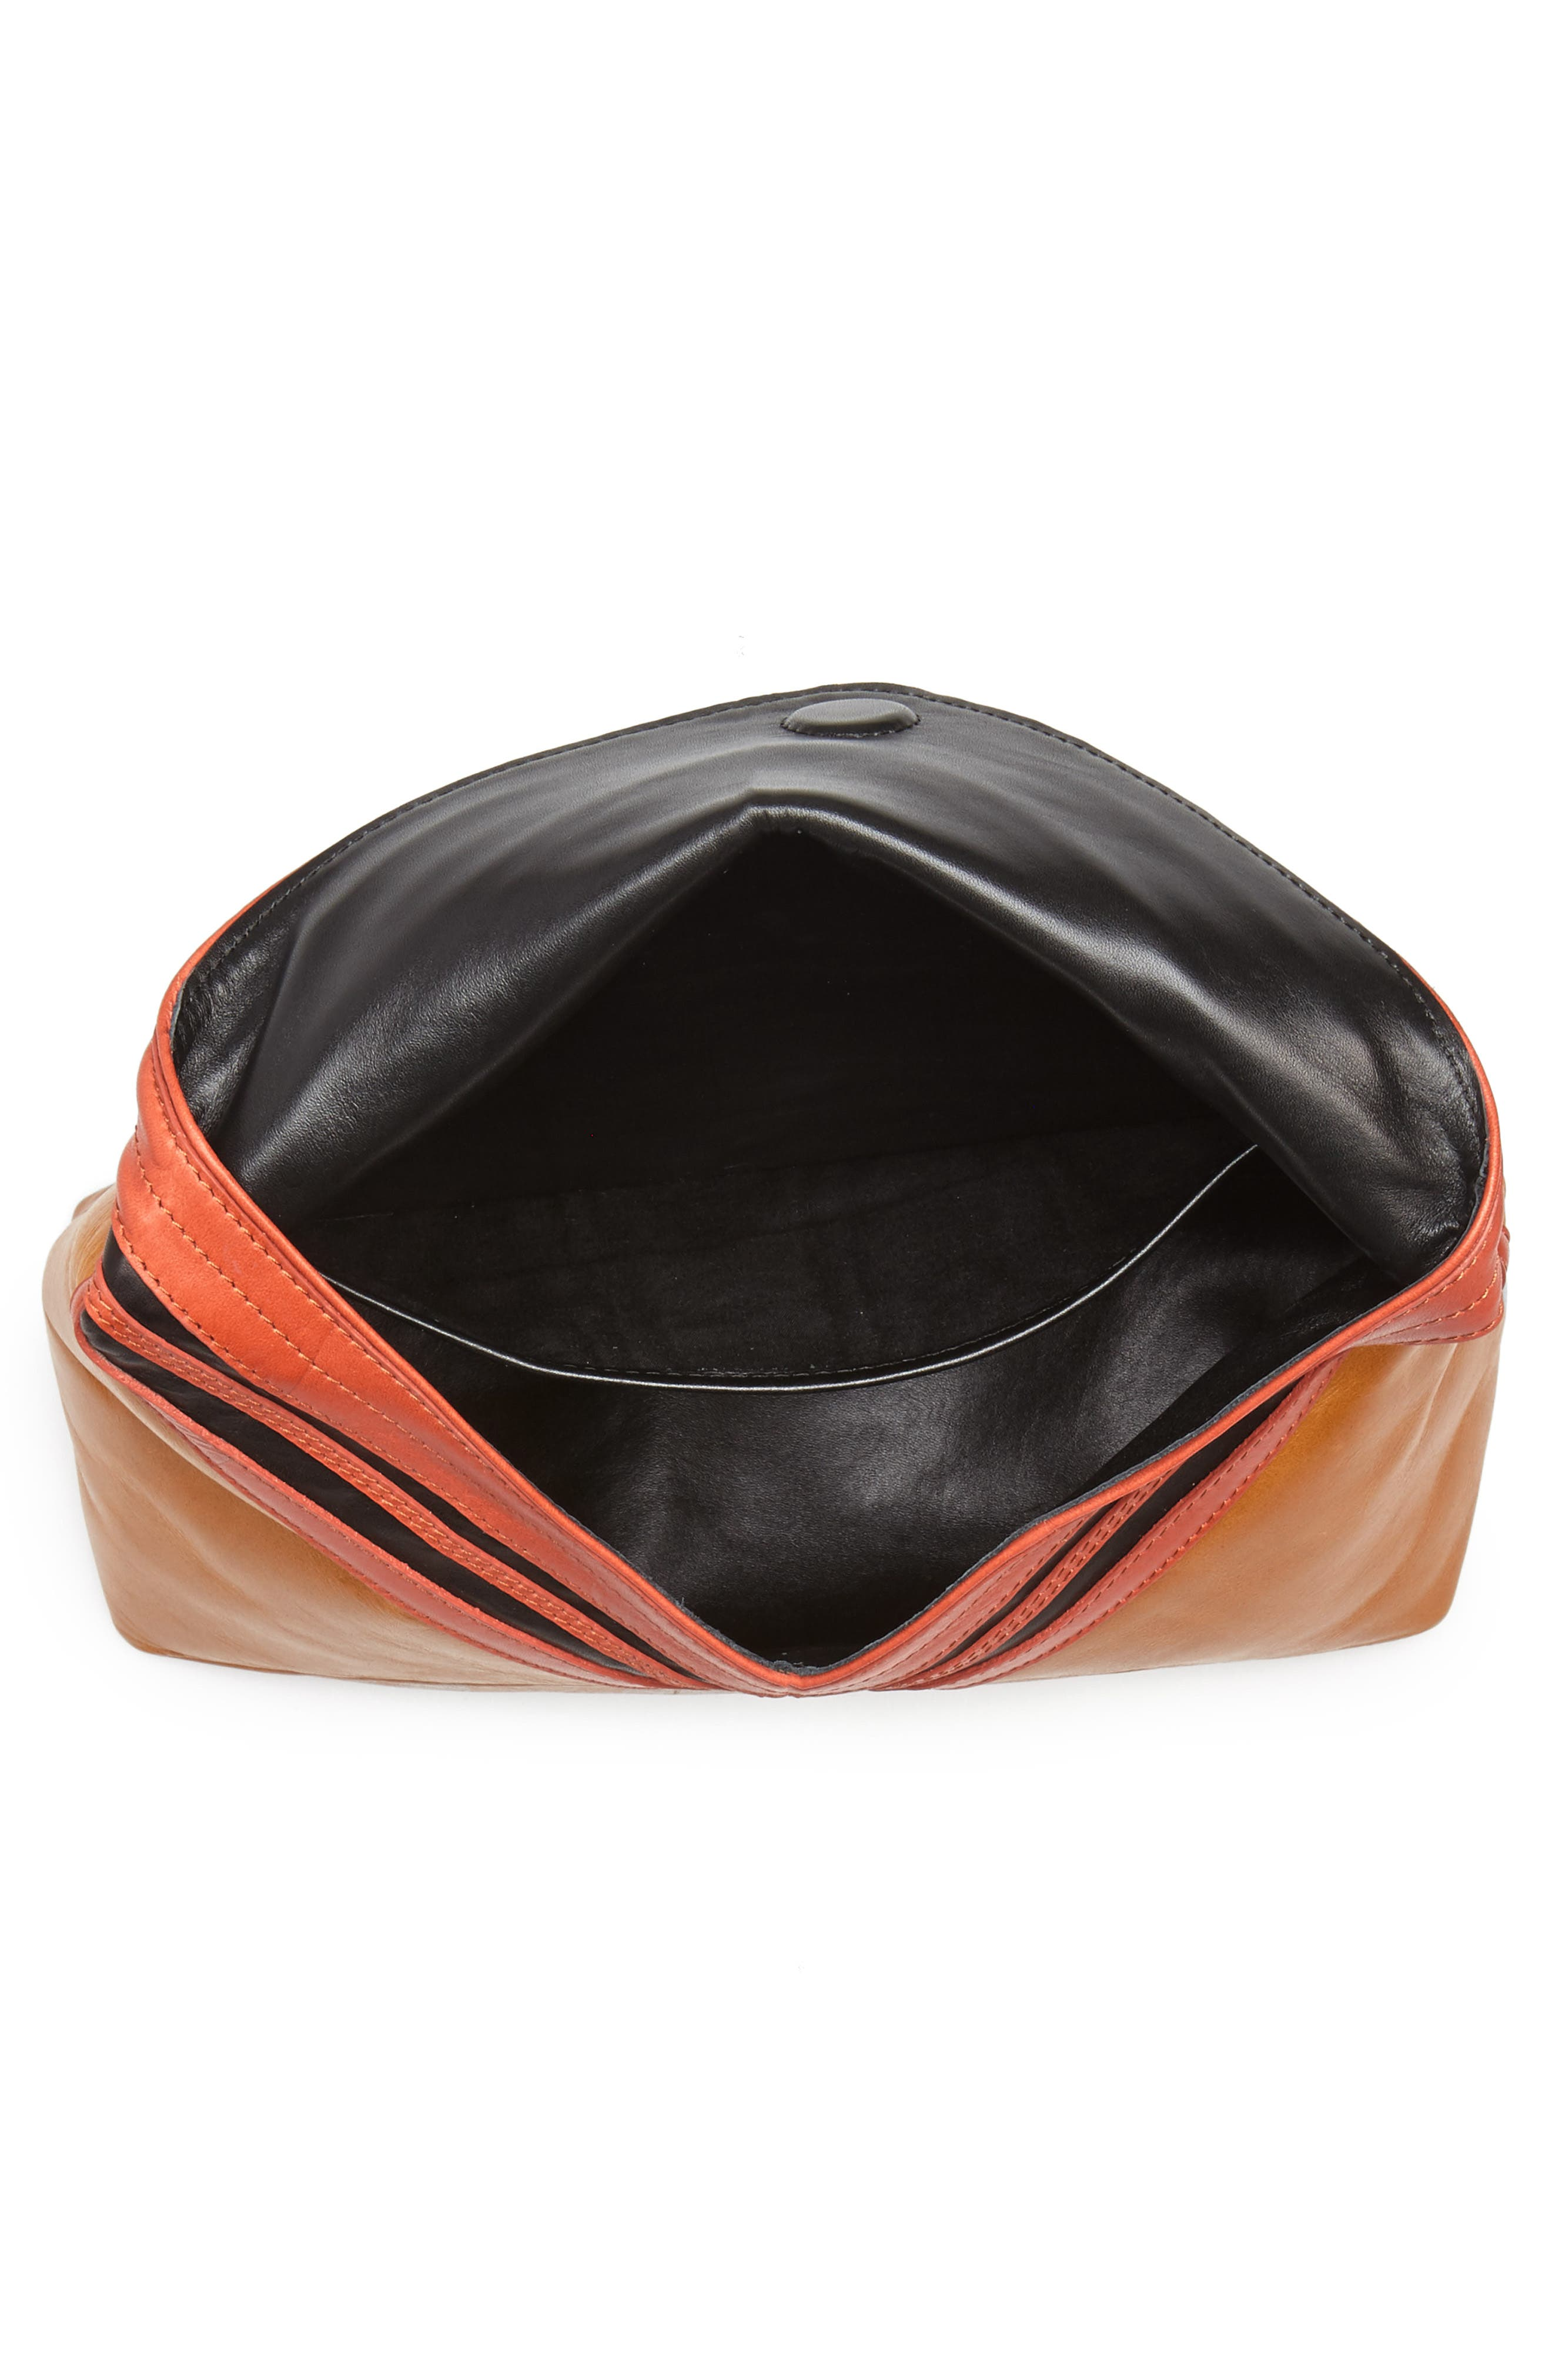 Leather Envelope Clutch,                             Alternate thumbnail 4, color,                             Camel